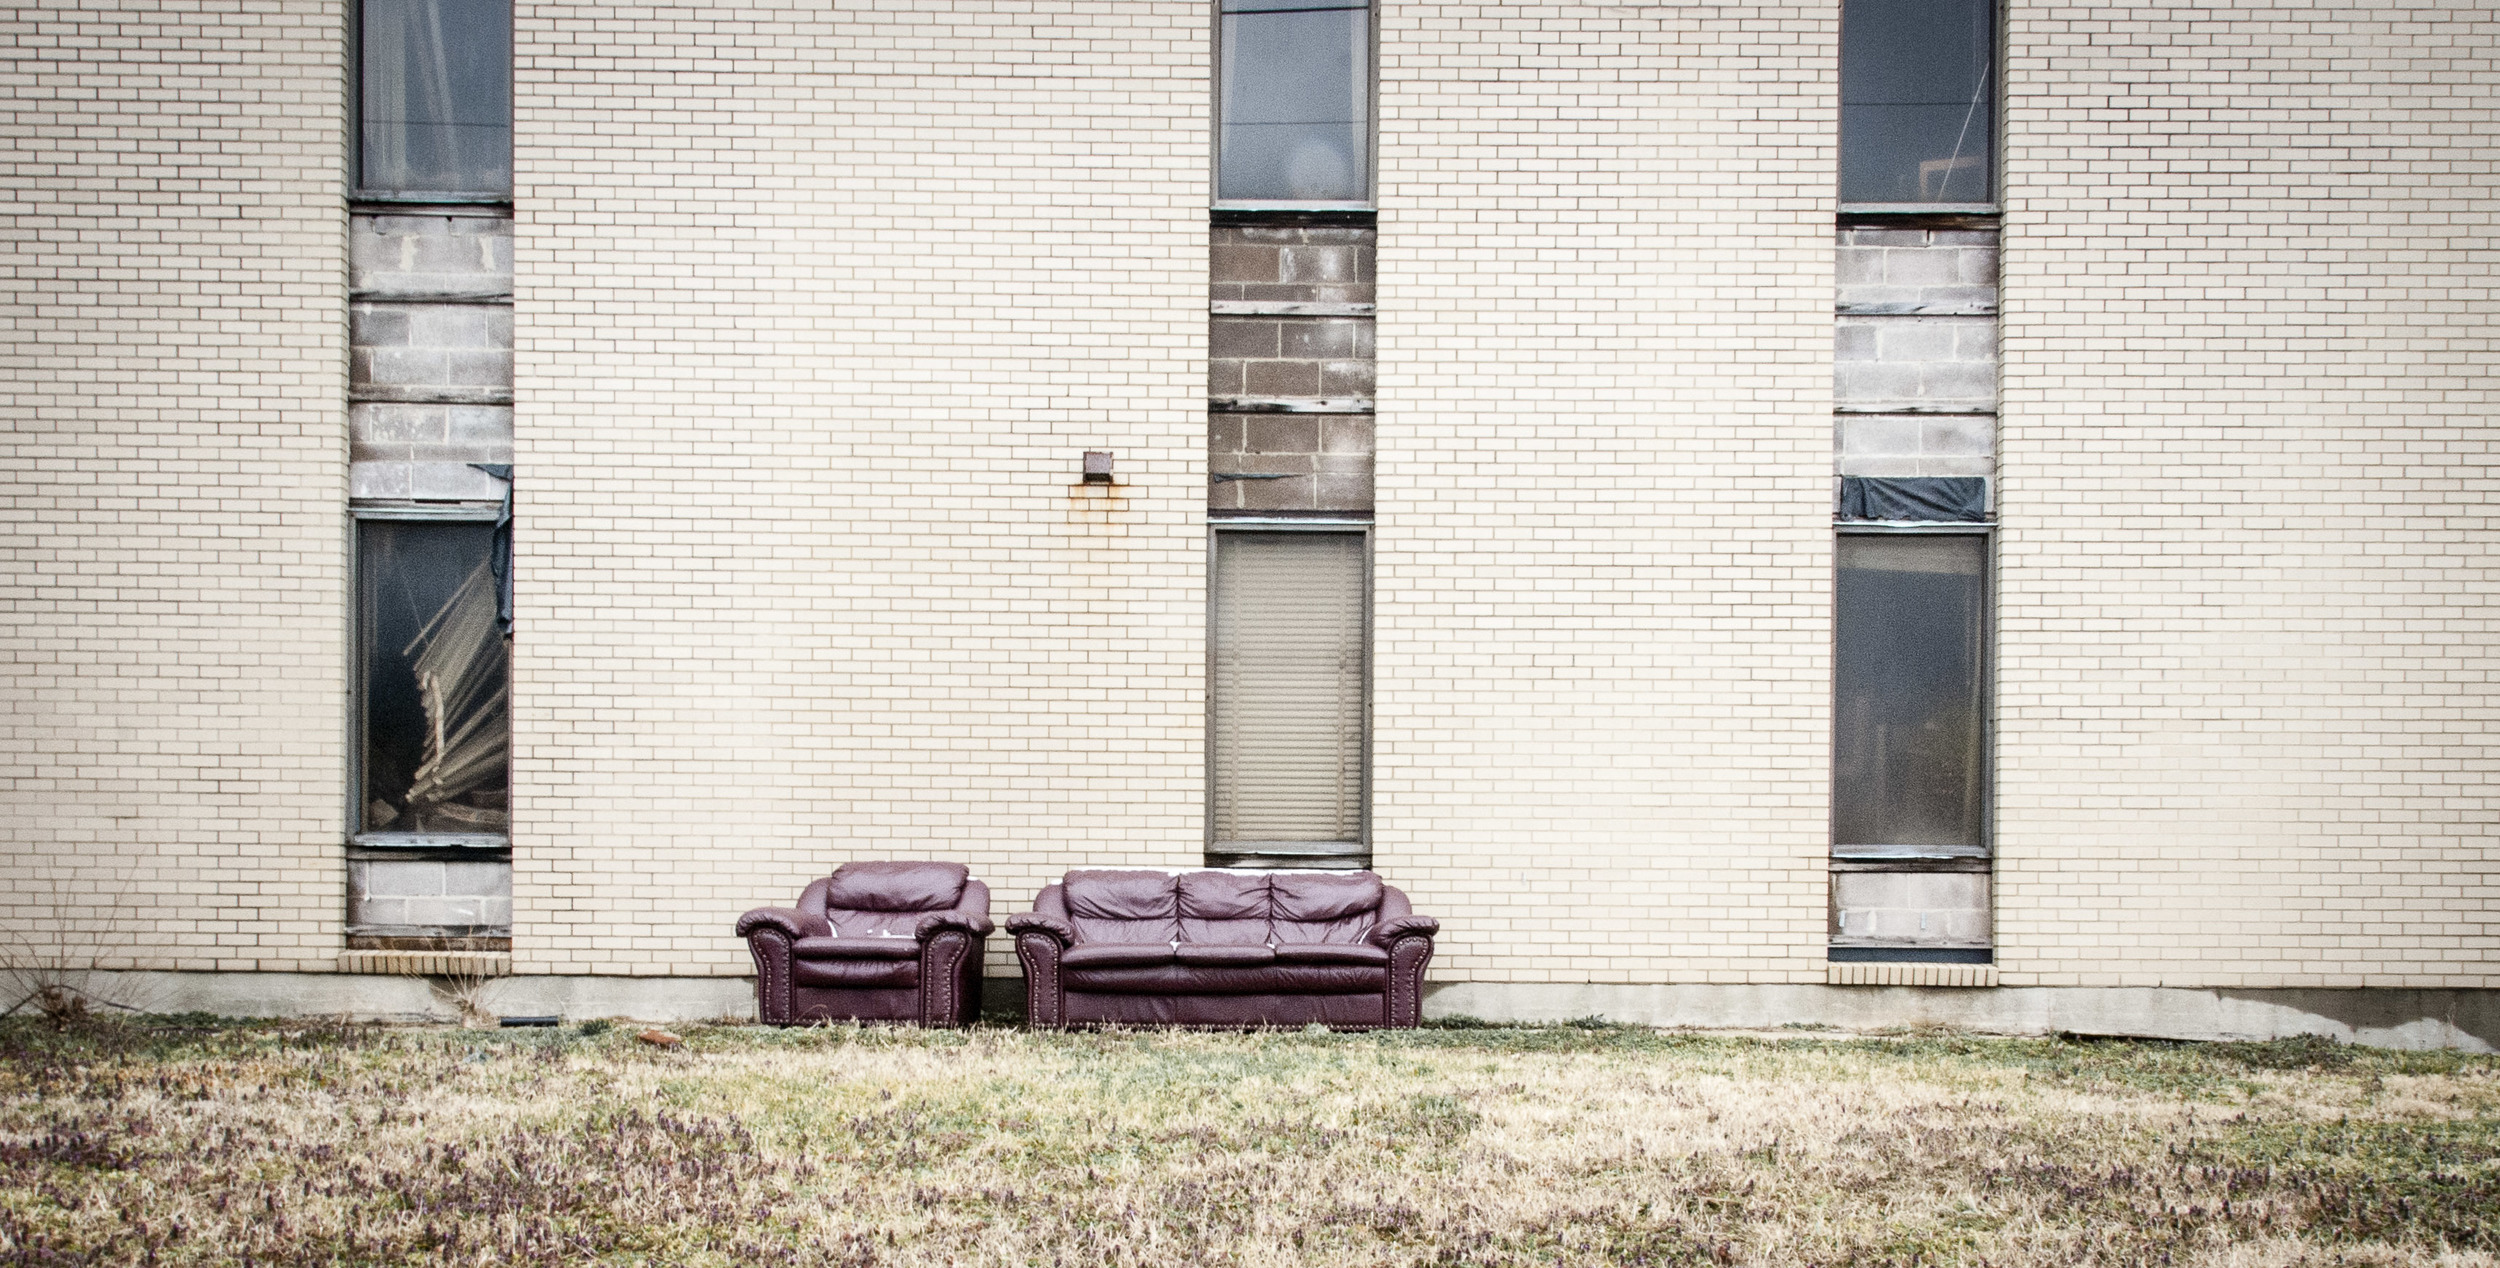 002-181311-0413-abandoned.jpg